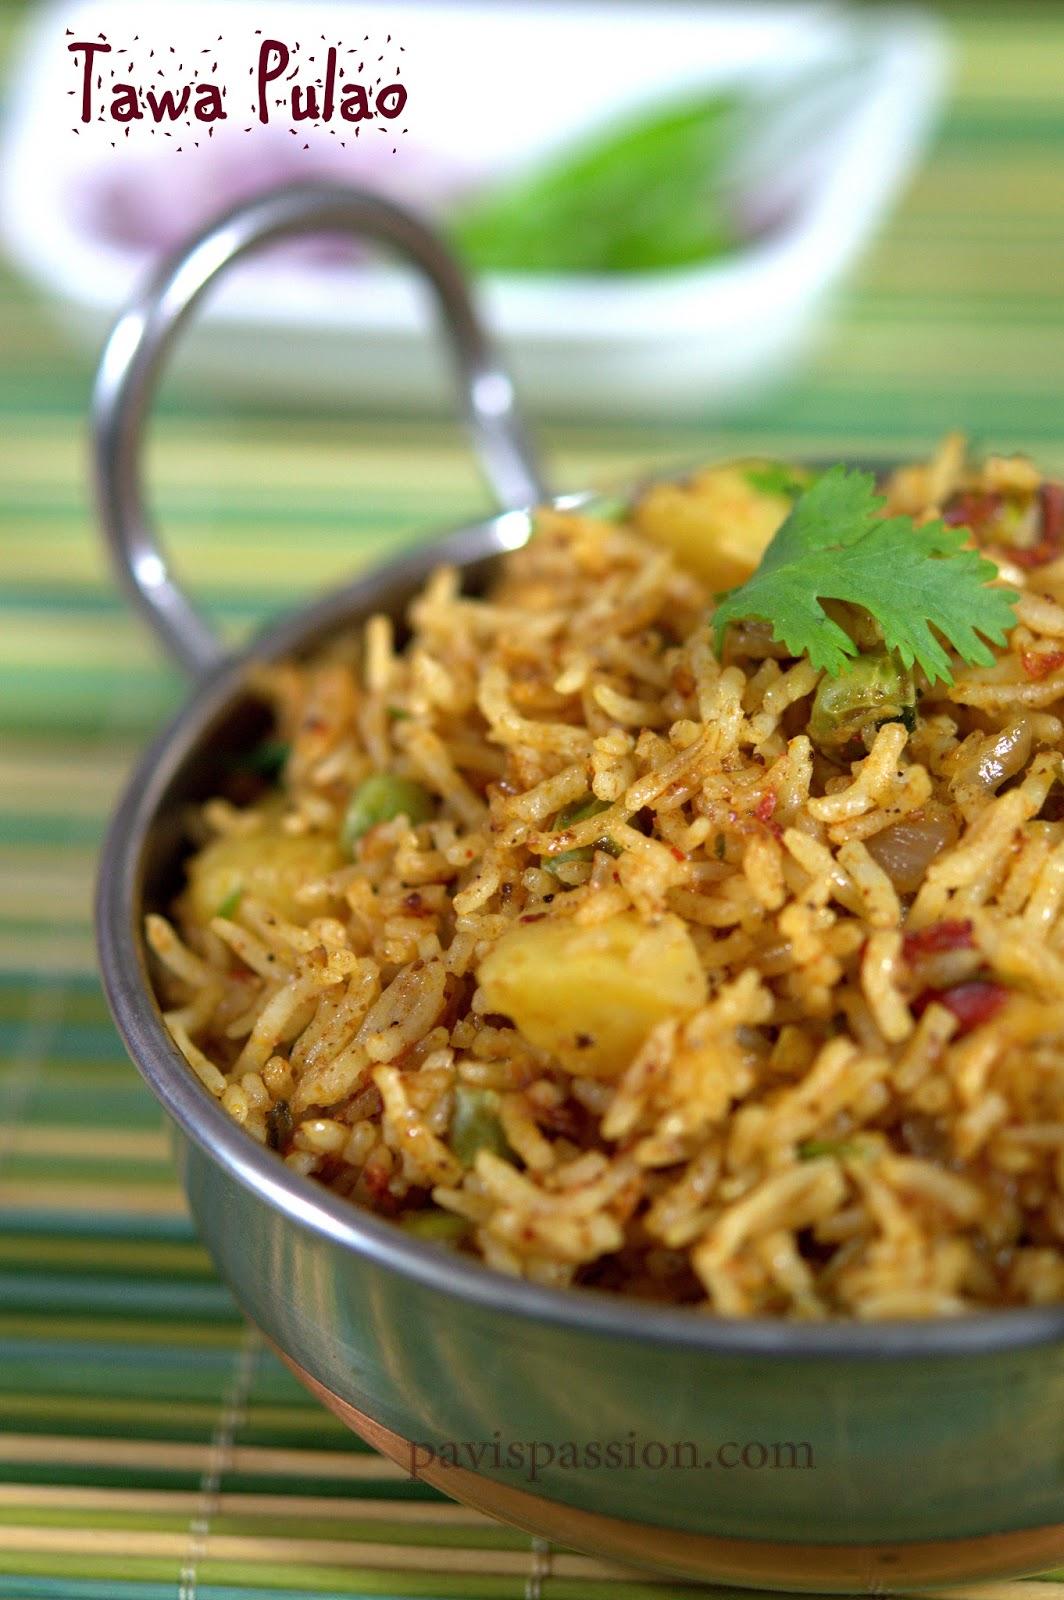 Pavispassion tawa pulao easy and quick pulao from left over rice tawa pulao easy and quick pulao from left over rice mumbai street food recipe forumfinder Images